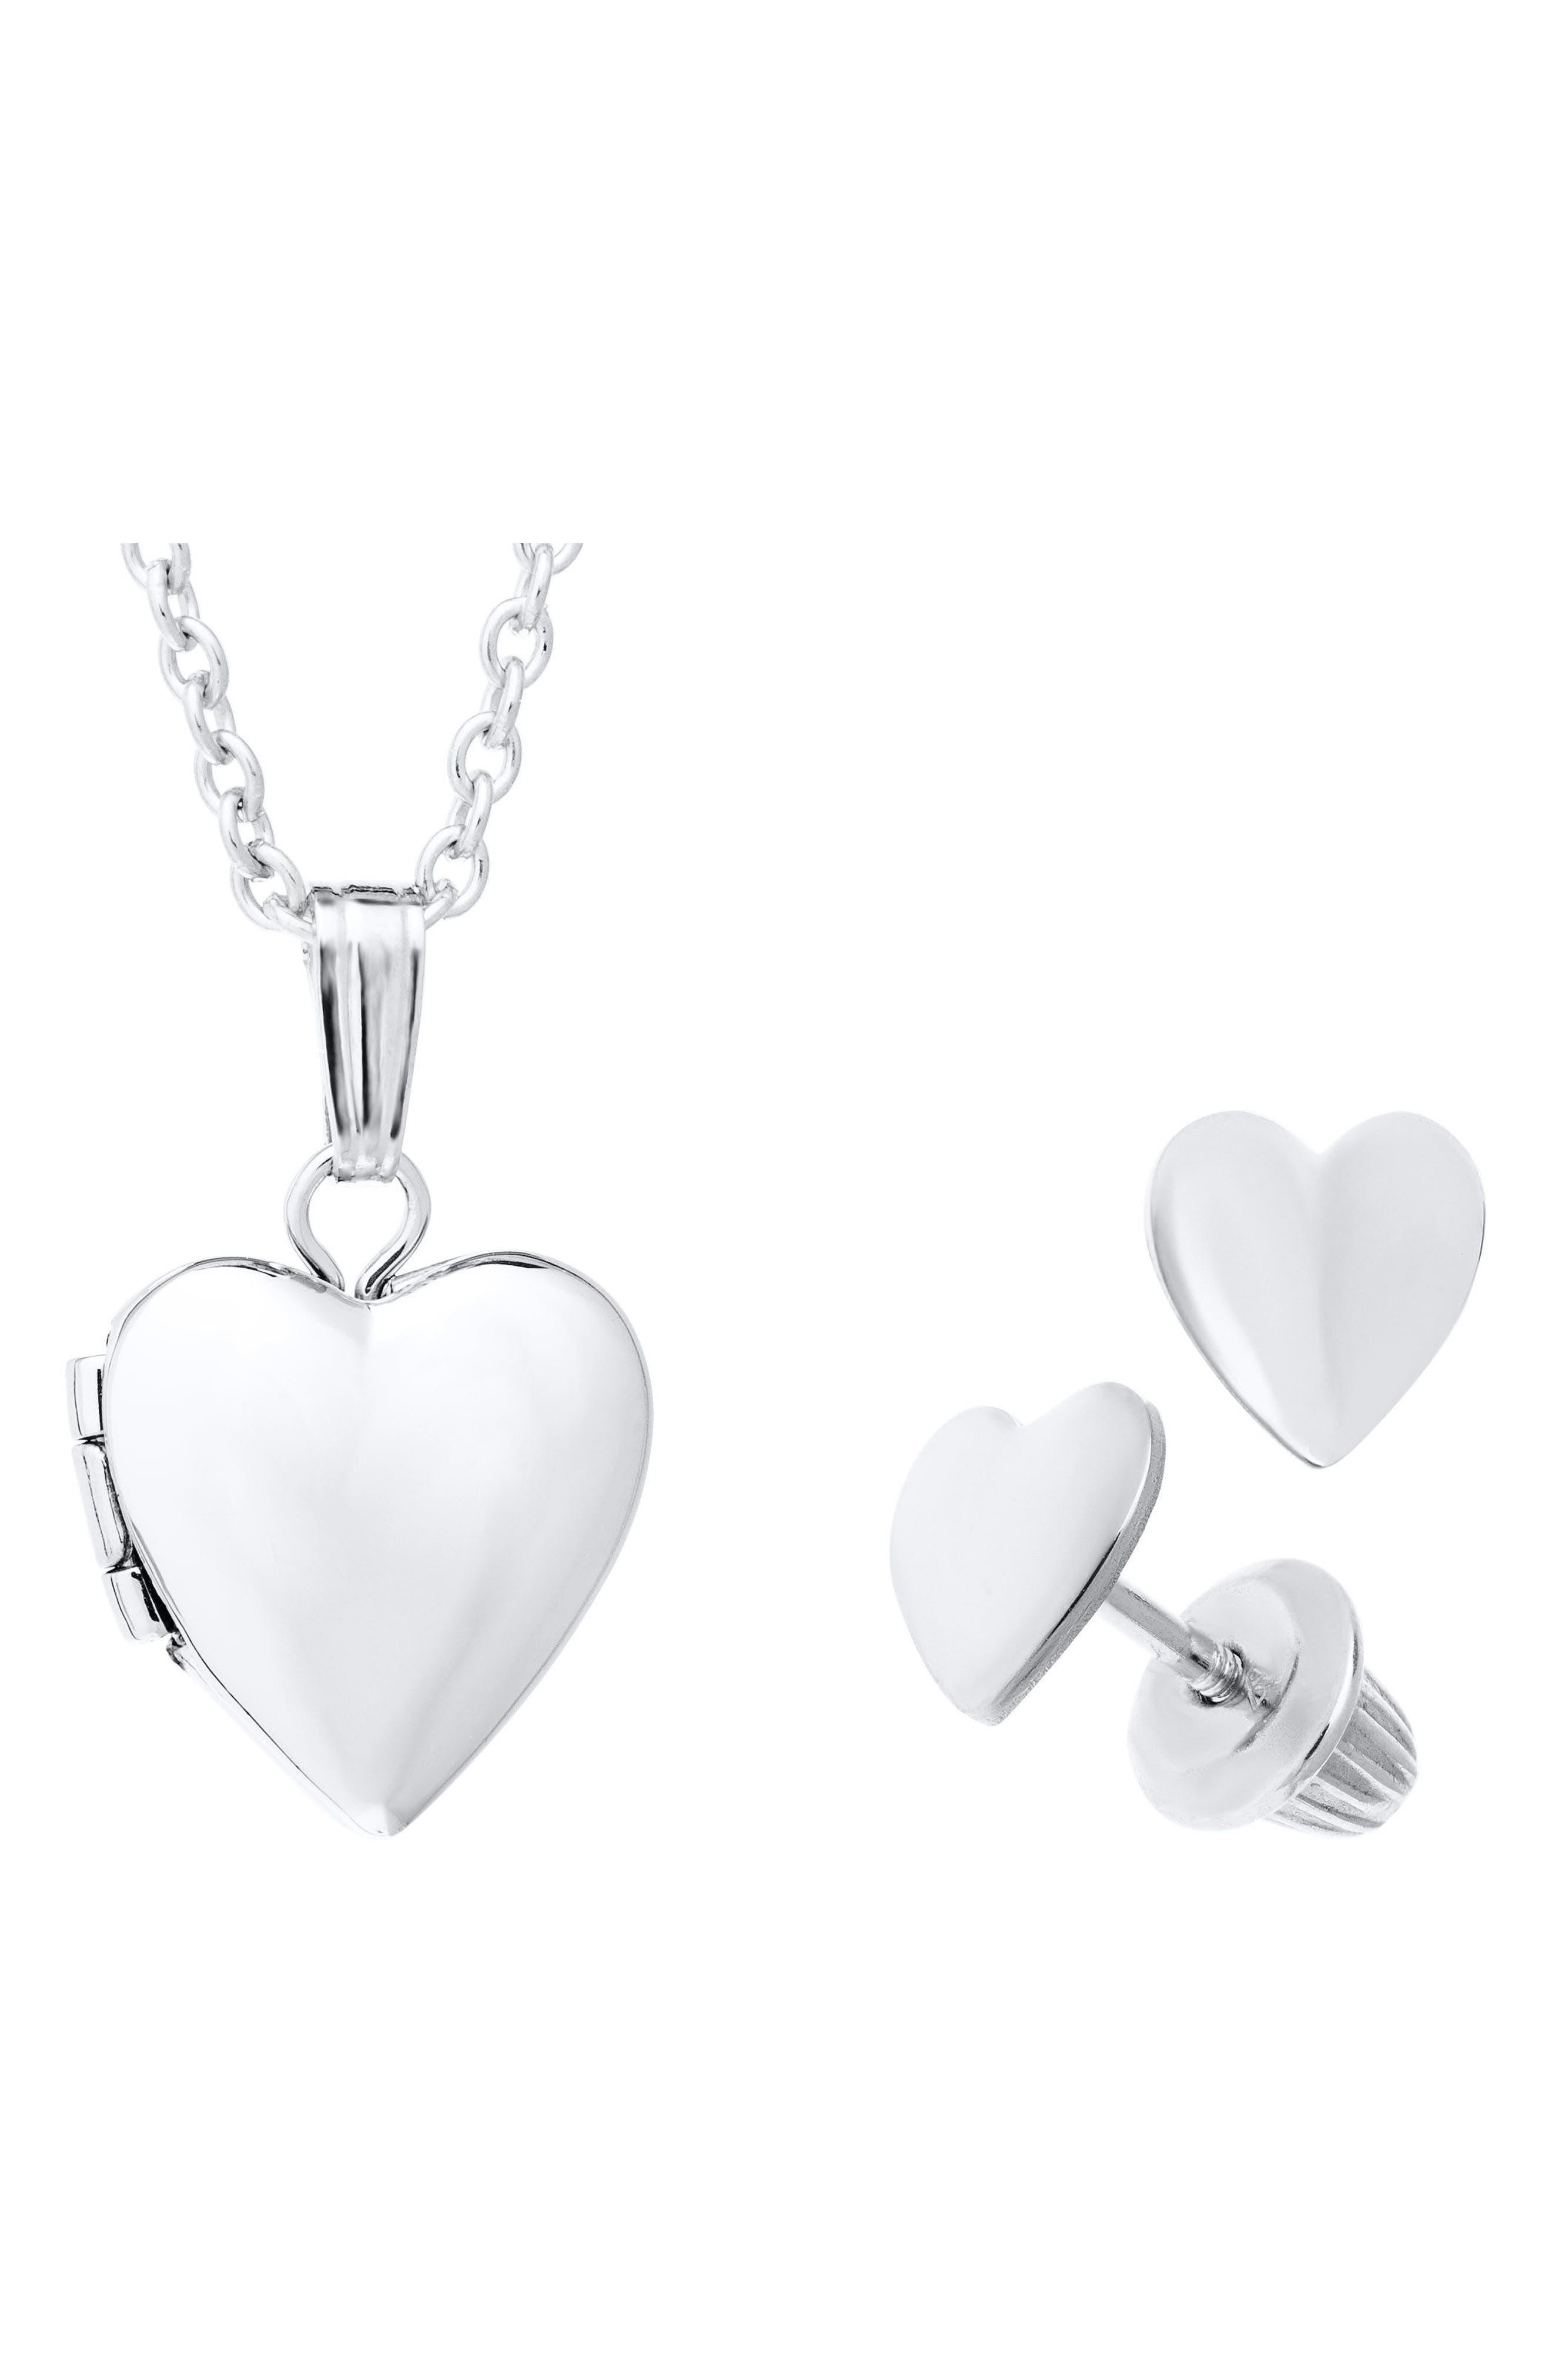 Alternate Image 1 Selected - Mignonette Sterling Silver Heart Locket Necklace & Earrings Set (Girls)